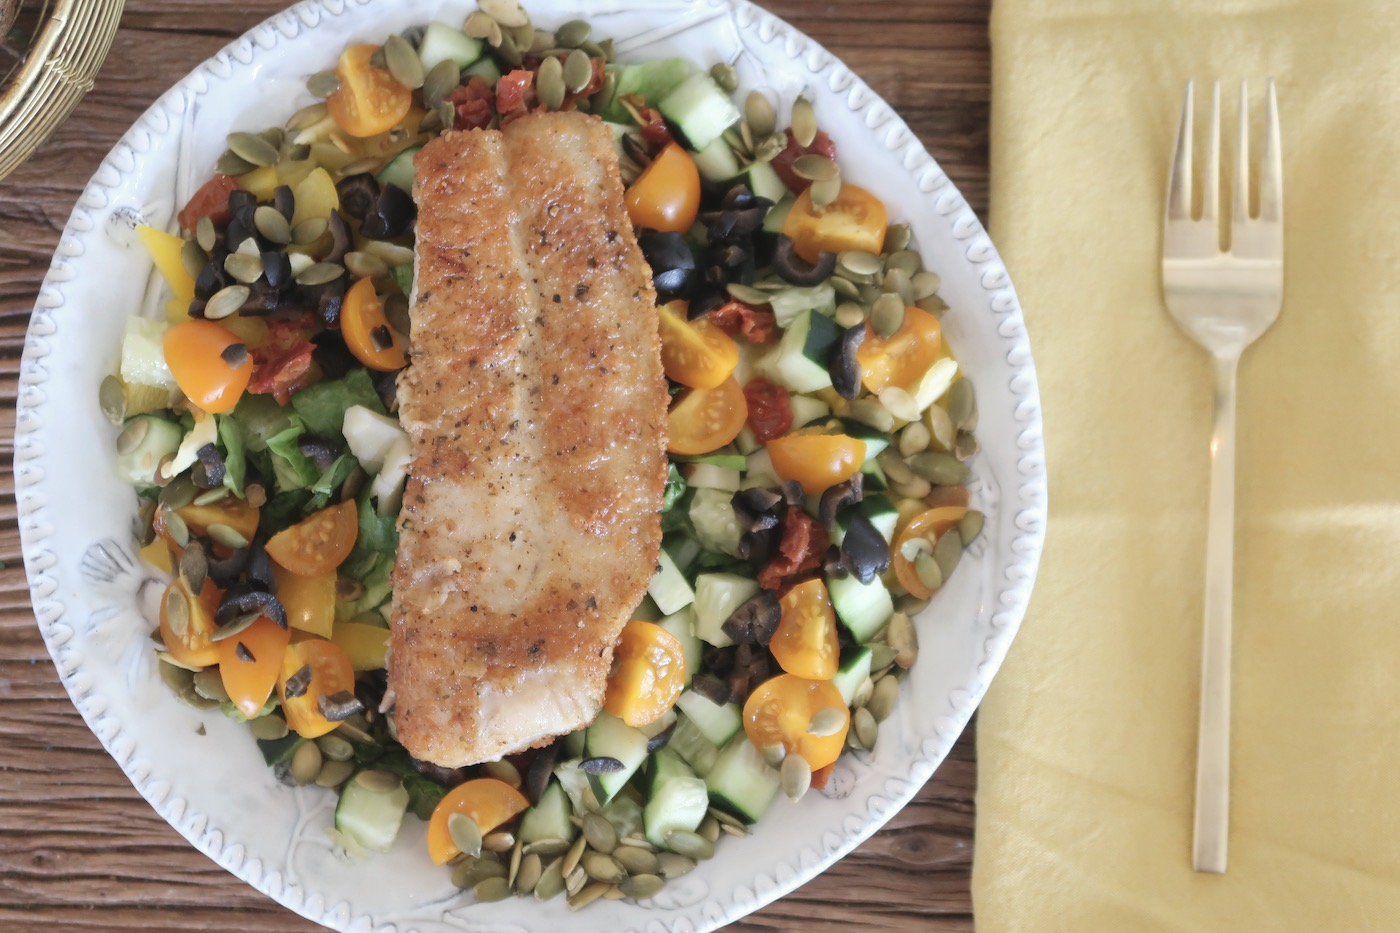 Tuscan Chopped Salad with Pan-Roasted Catfish